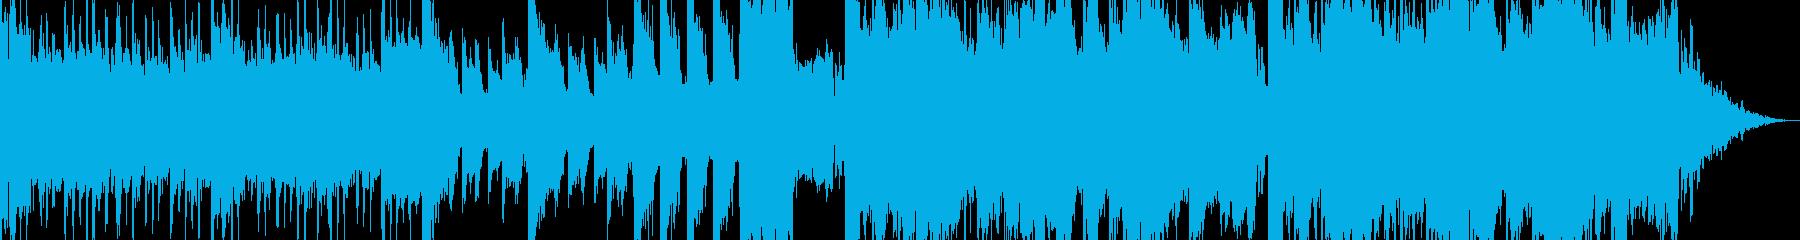 【EDM】エネルギッシュ・鼓舞_02の再生済みの波形